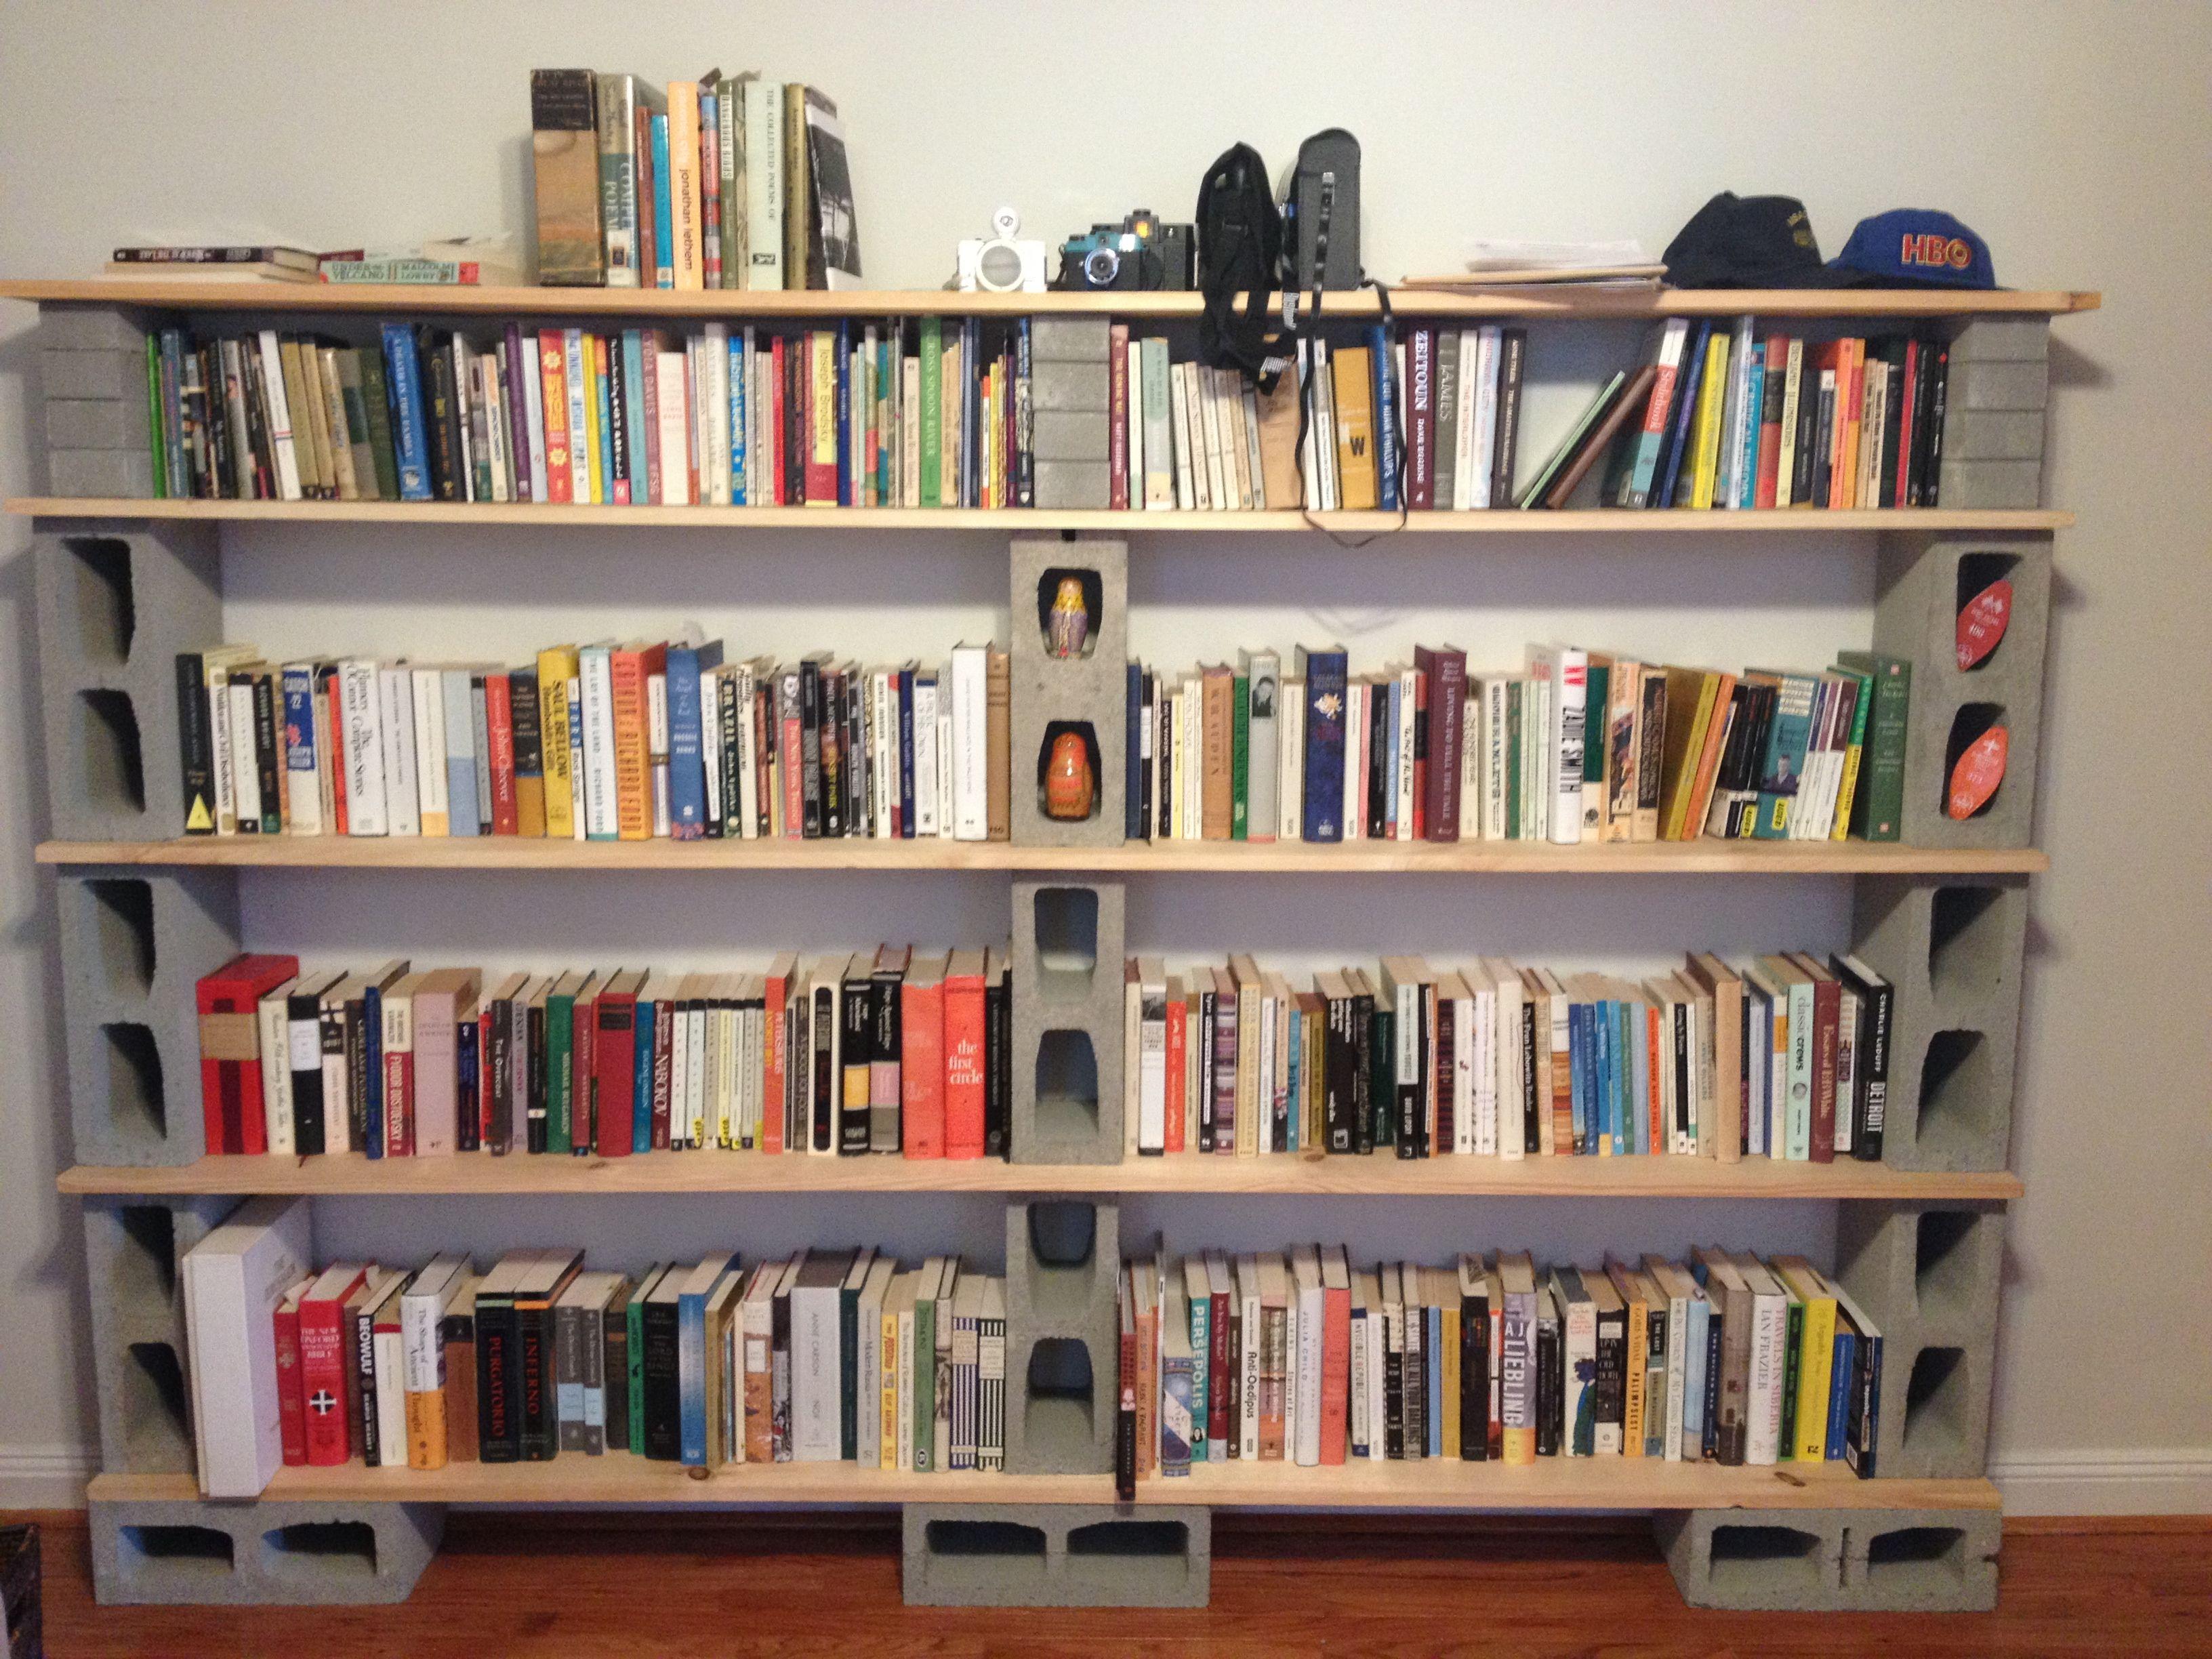 Diy cinderblock bookshelf creations pinterest for How to make cheap bookshelves